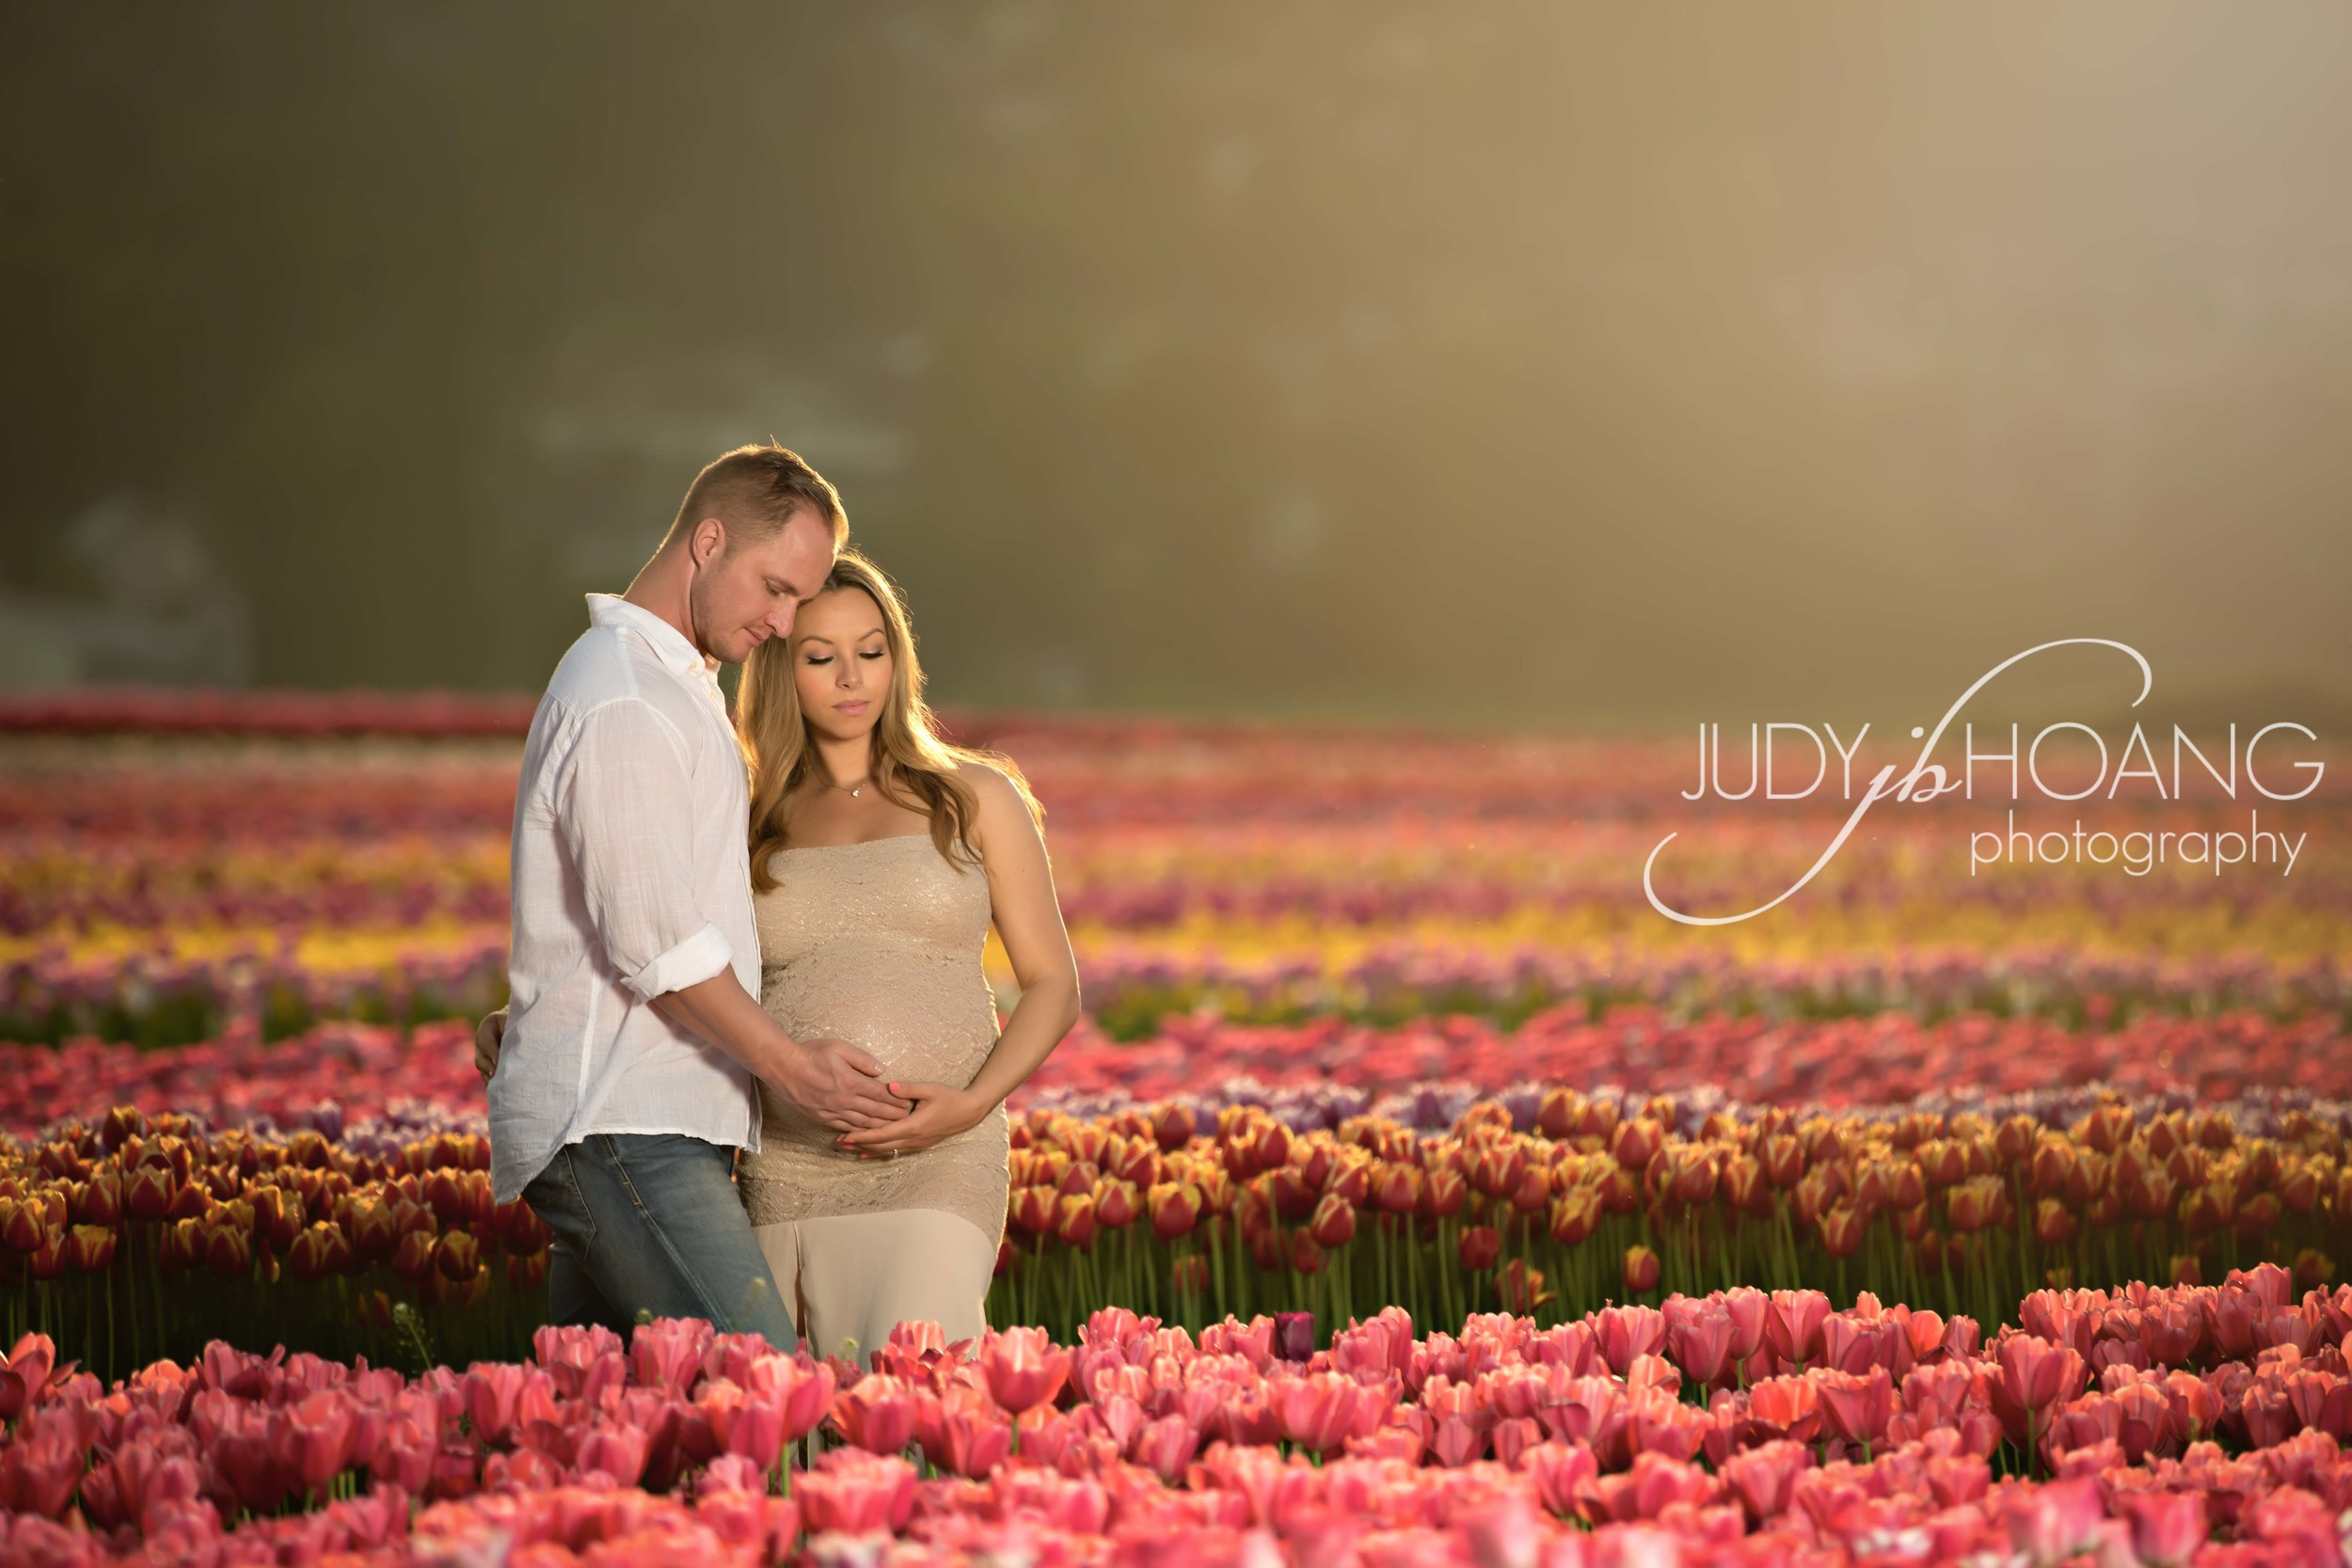 Judy Hoang Photography - Kelsey Maternity-1.JPG